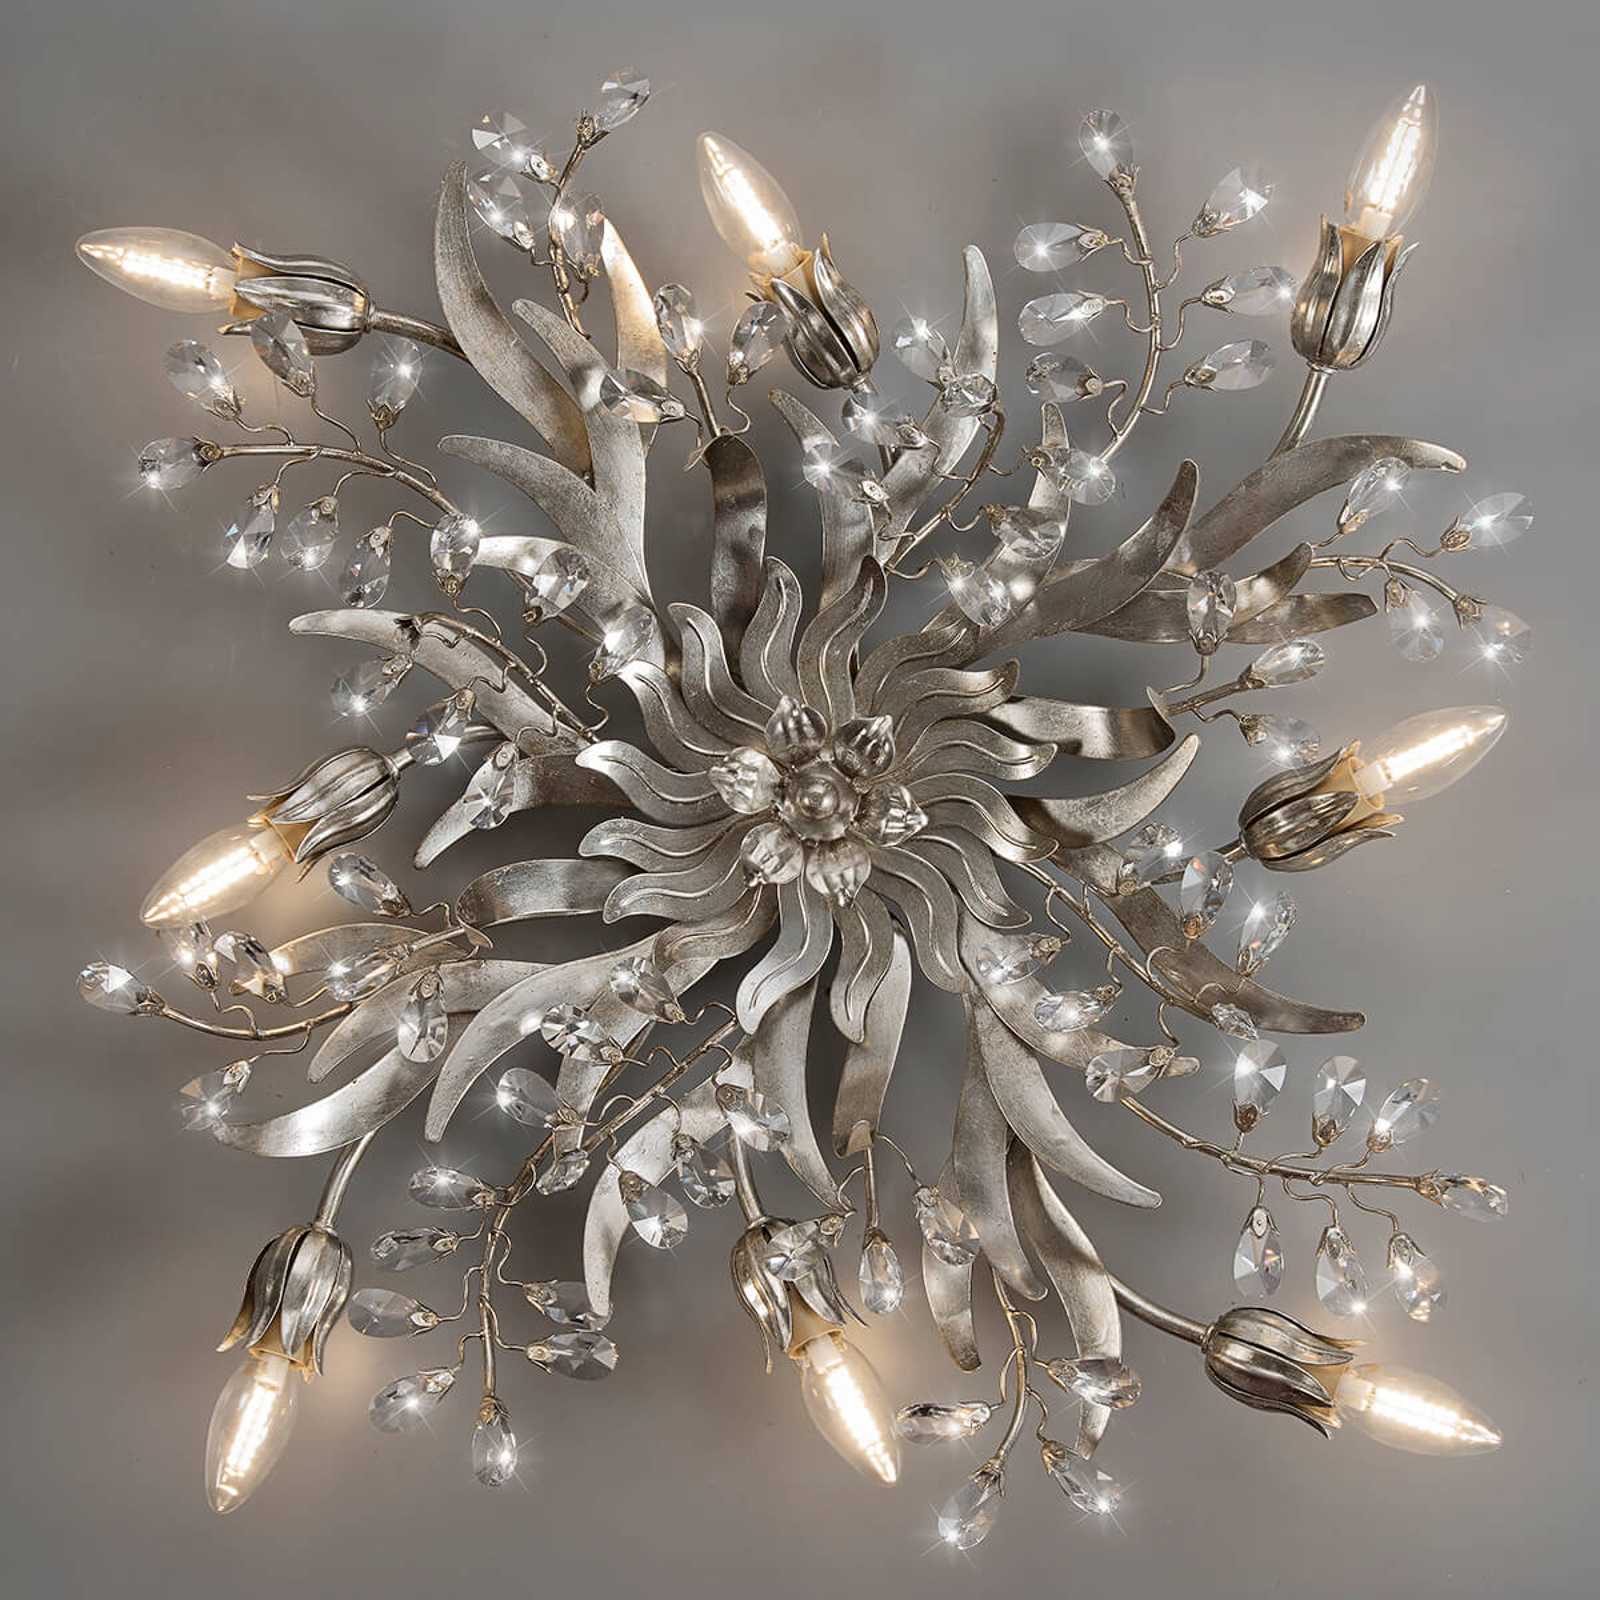 Taklampe Sara i florentinerstil, 8 lys